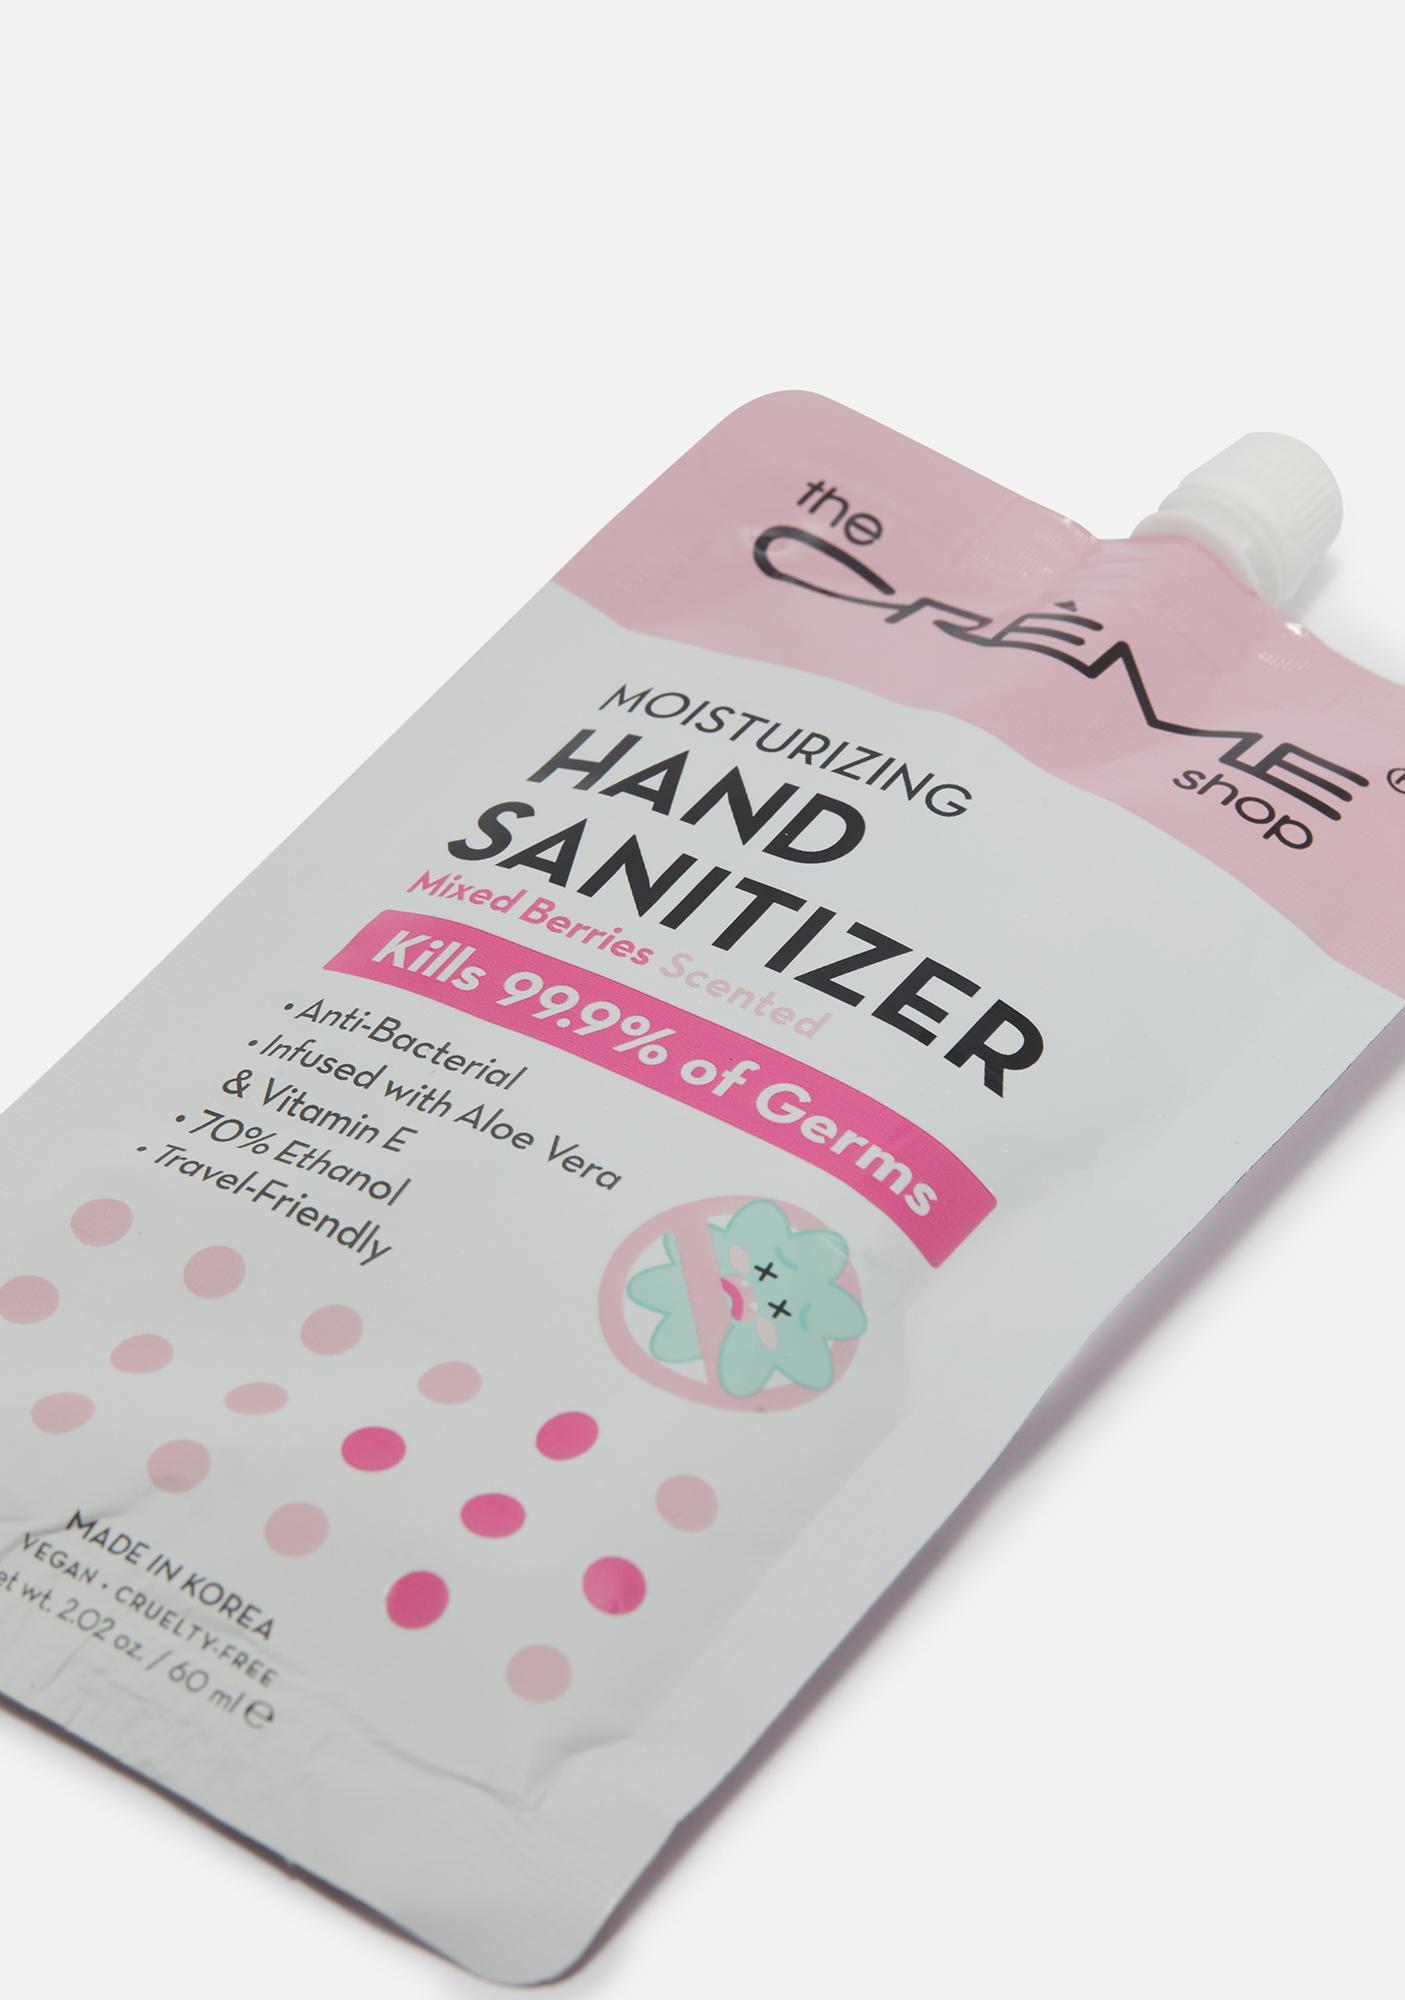 The Crème Shop Mixed Berries Moisturizing Hand Sanitizer